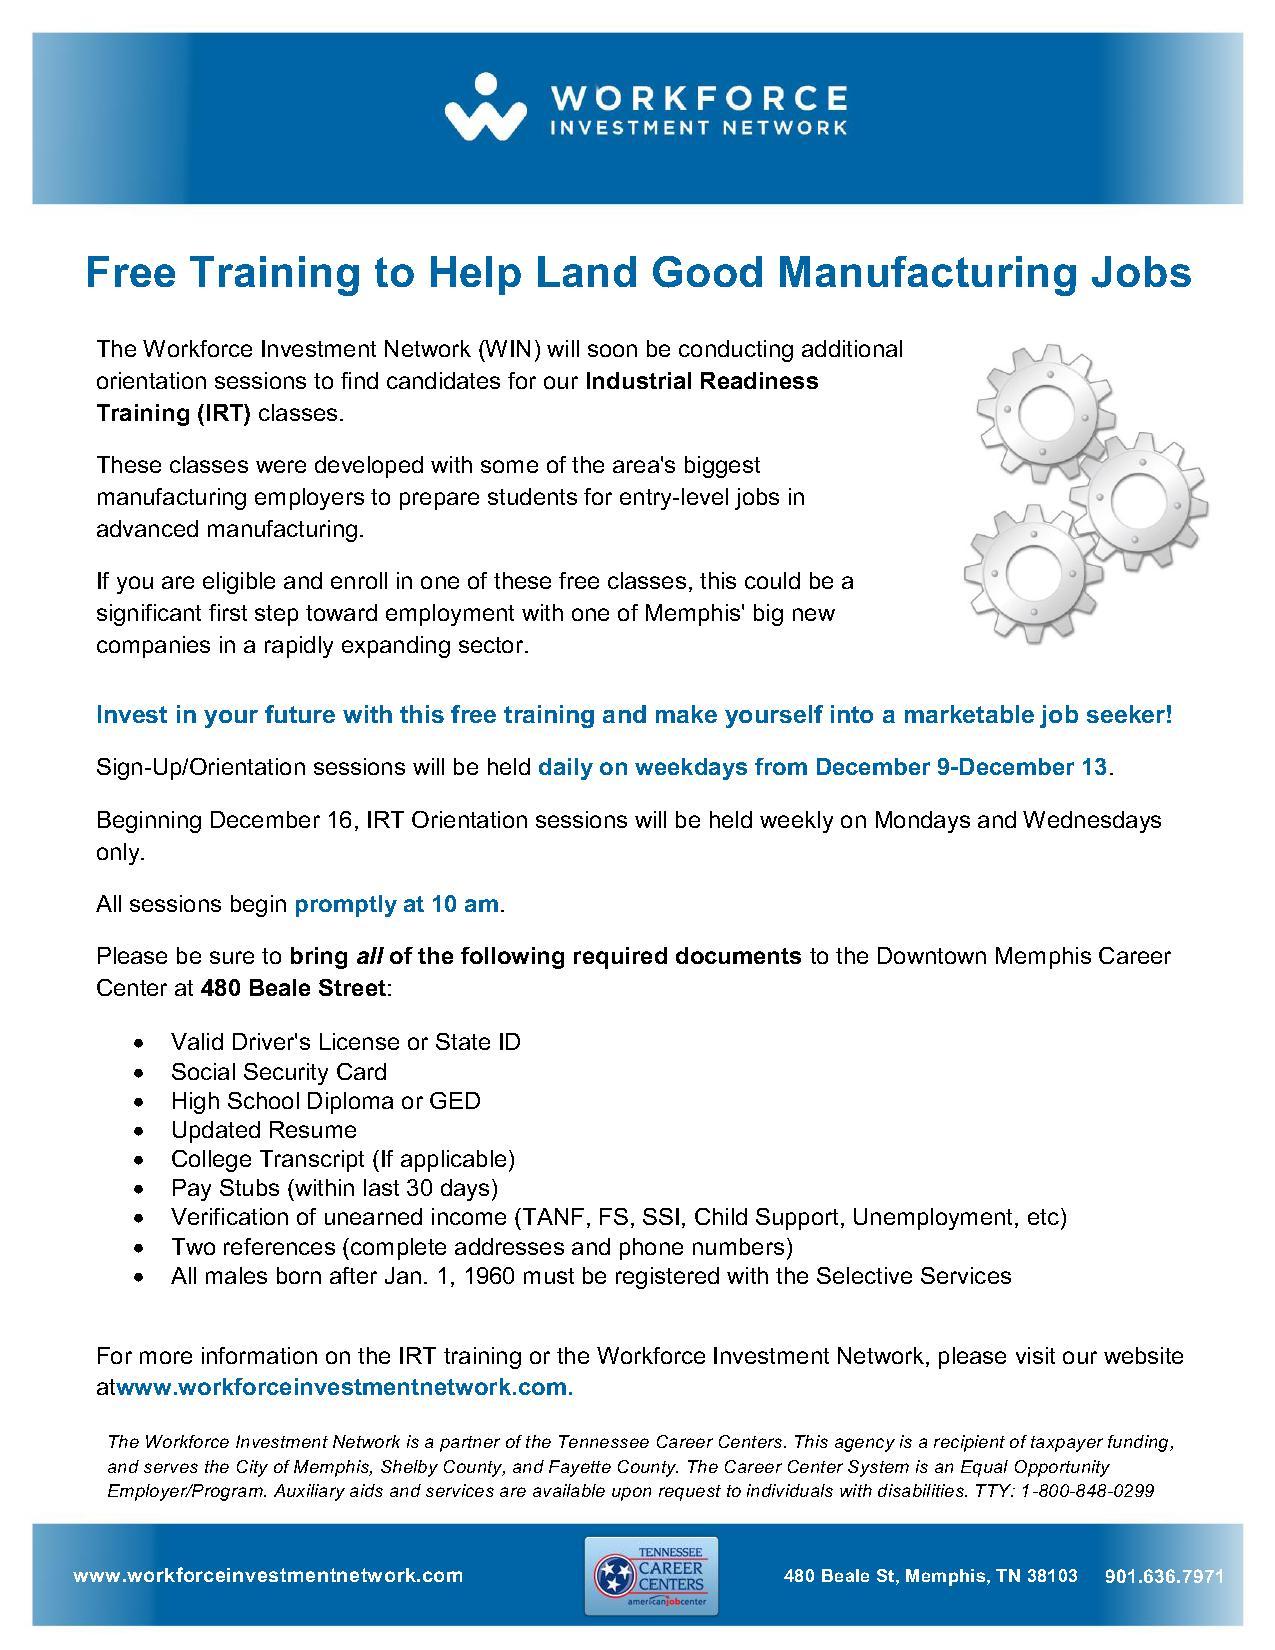 WIN Industrial Readiness Training IRT